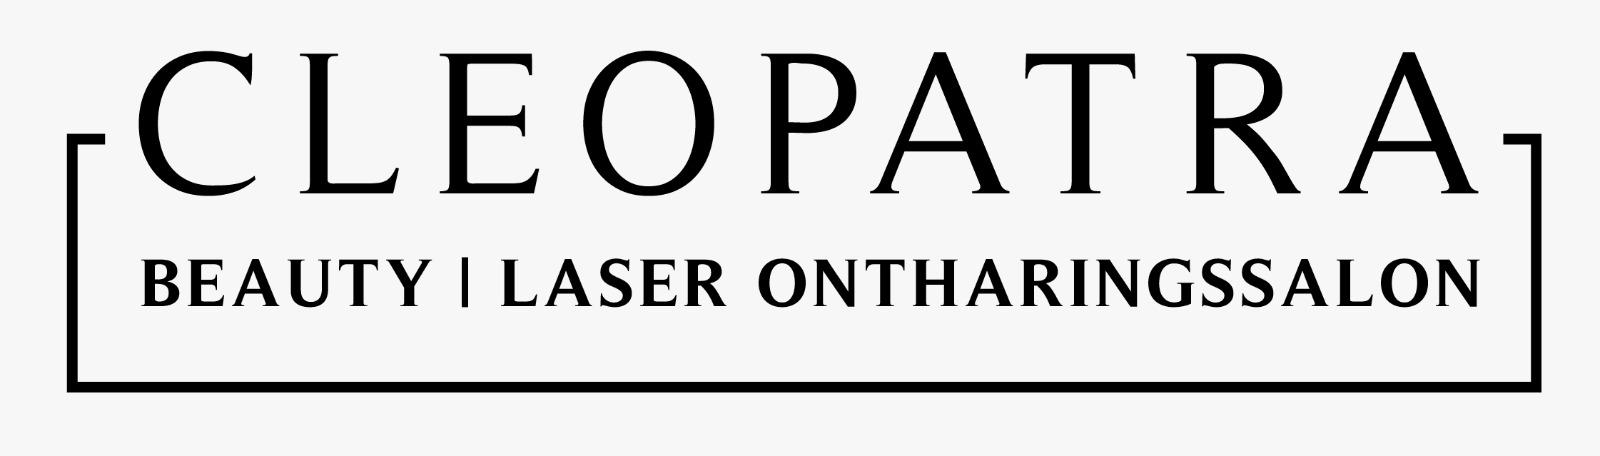 Cleopatra Beauty Laser & Ontharingssalon